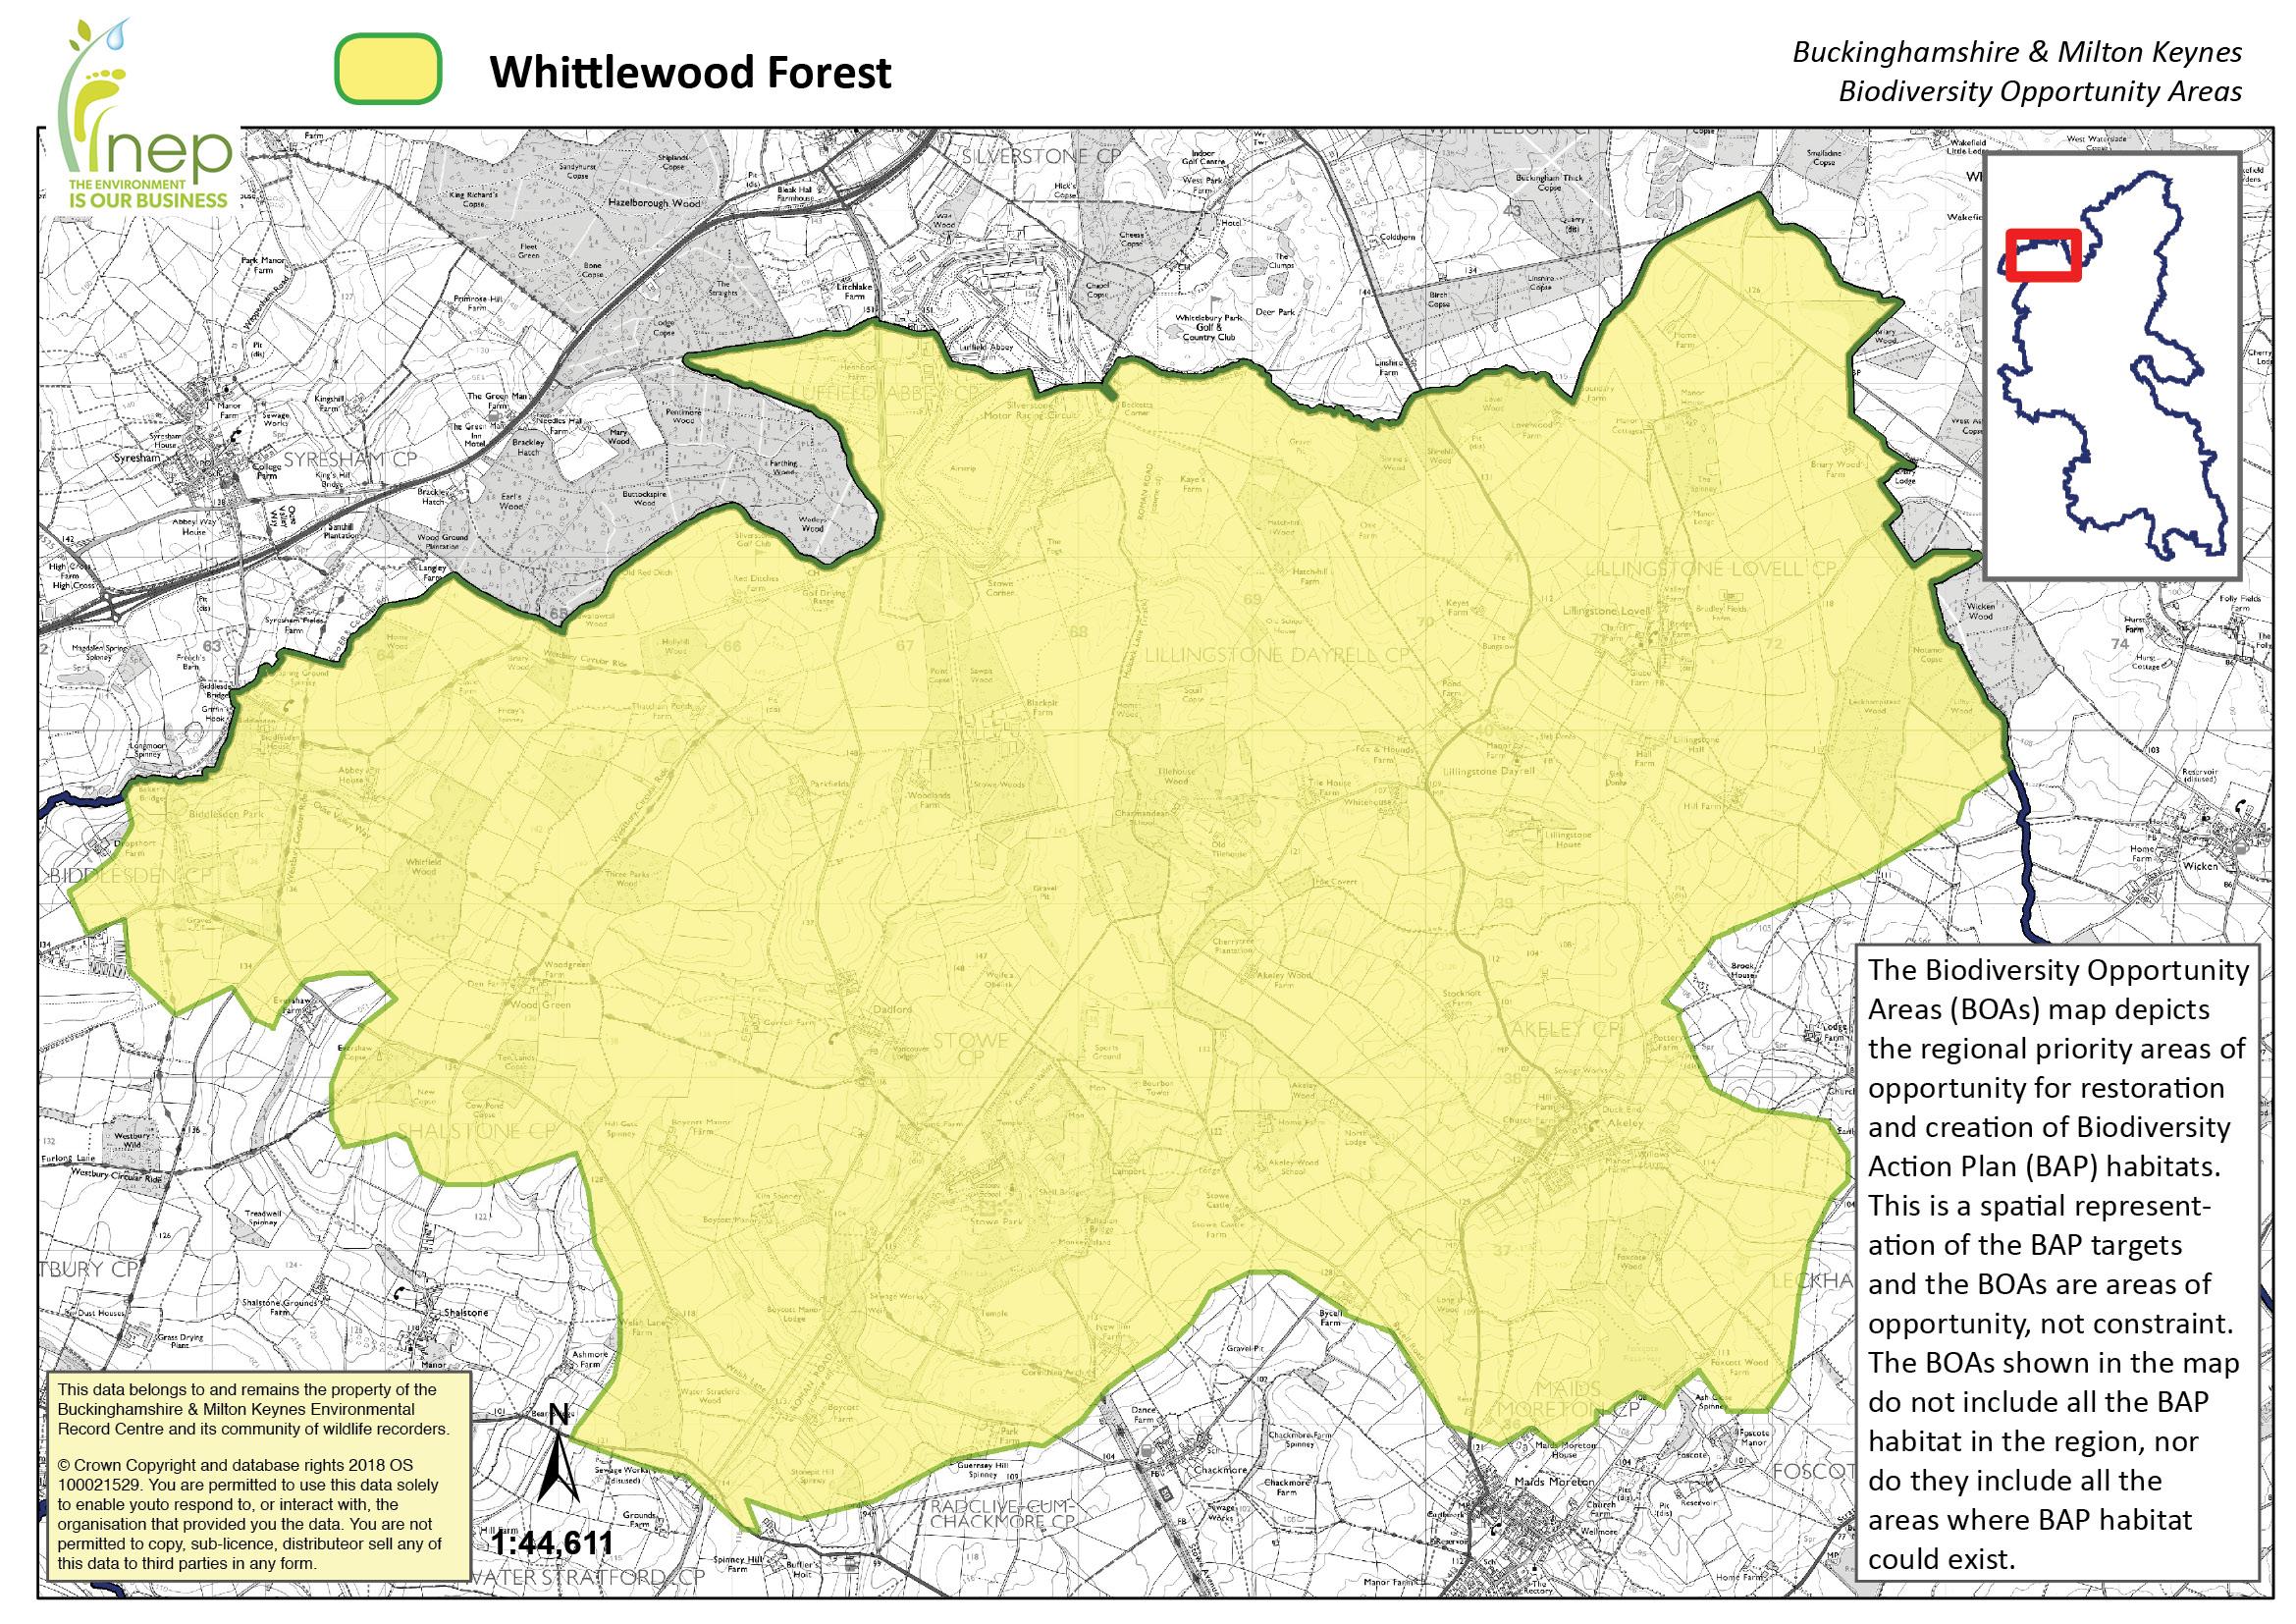 Whittlewood Forest Biodiversity Opportunity Area Buckinghamshire and Milton Keynes Natural Environment Partnership